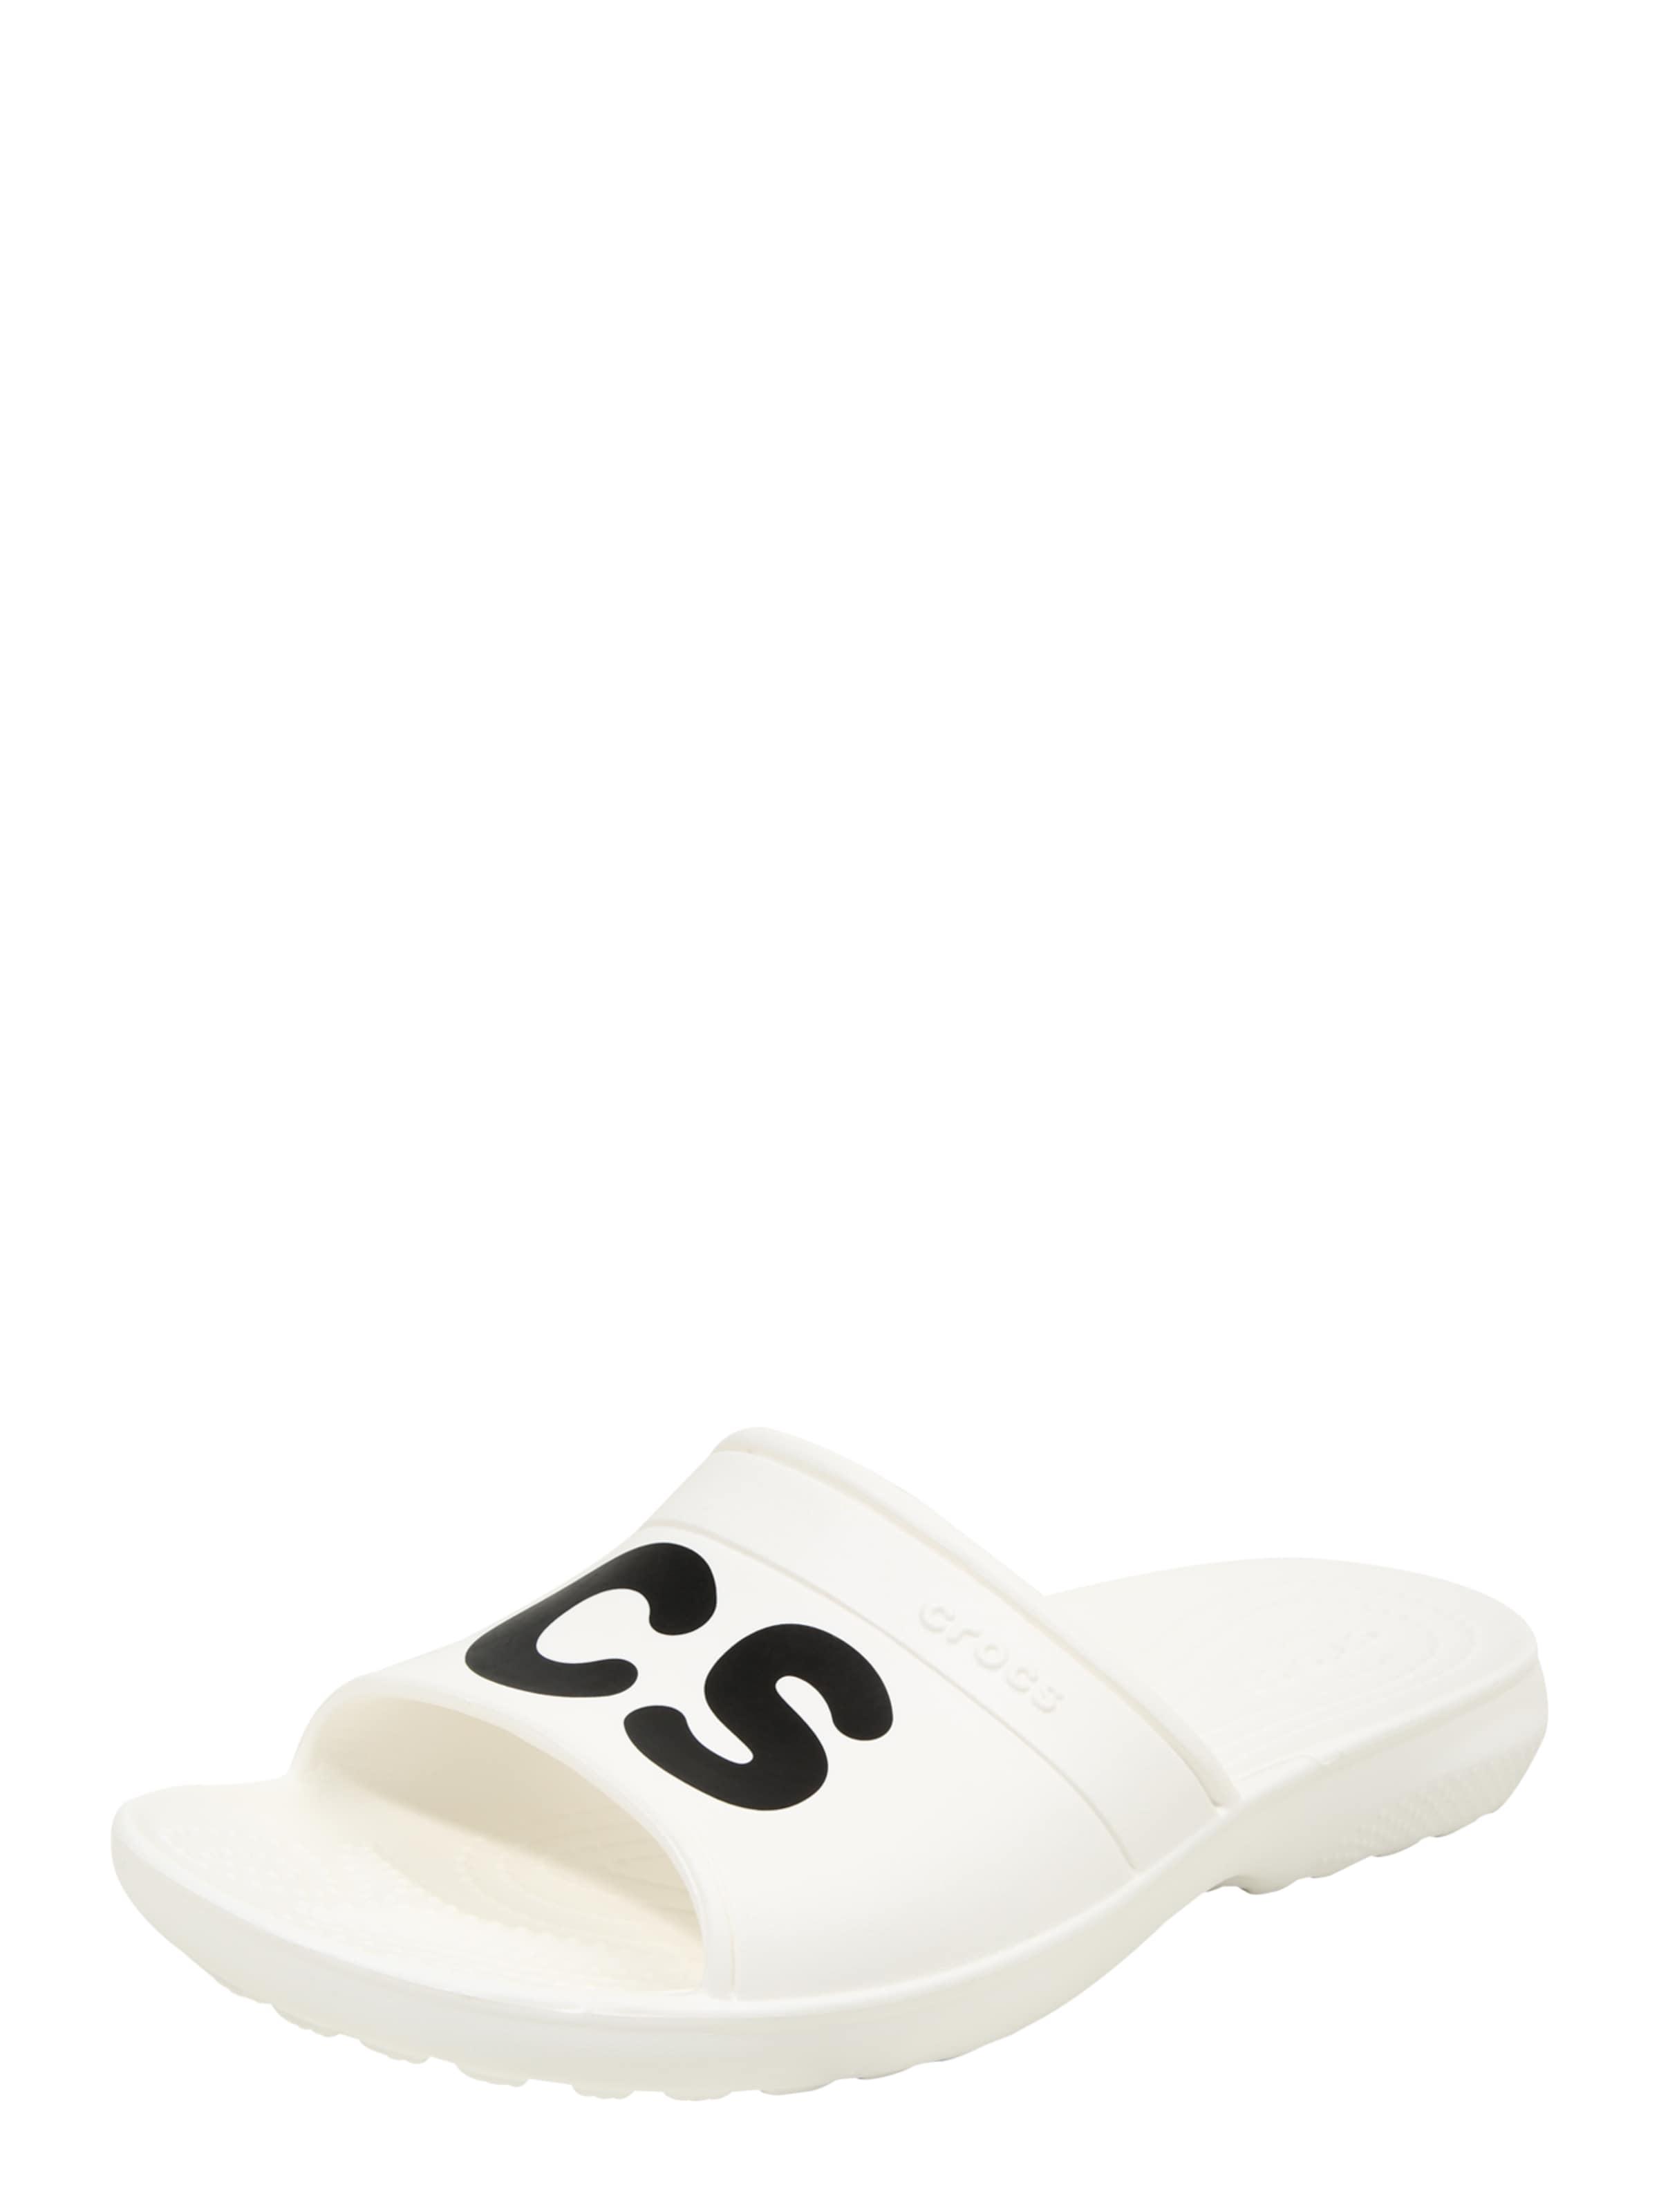 Crocs Badeschuhe Classic Graphic Verschleißfeste billige Schuhe